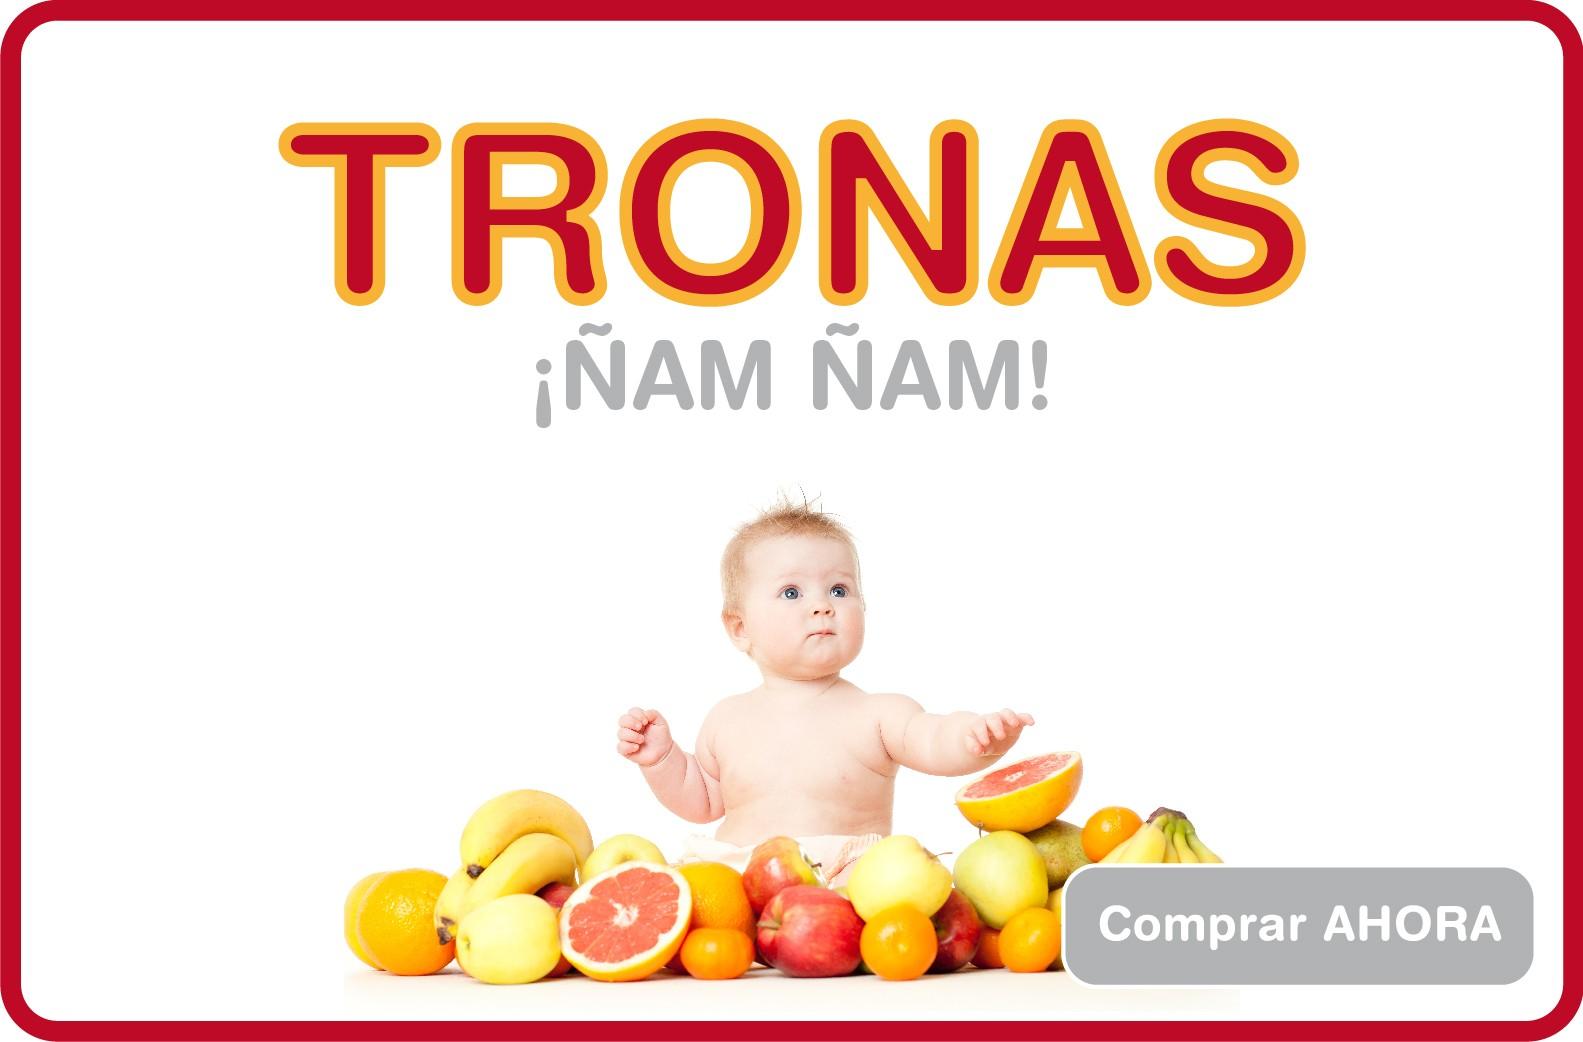 Tronas bebe